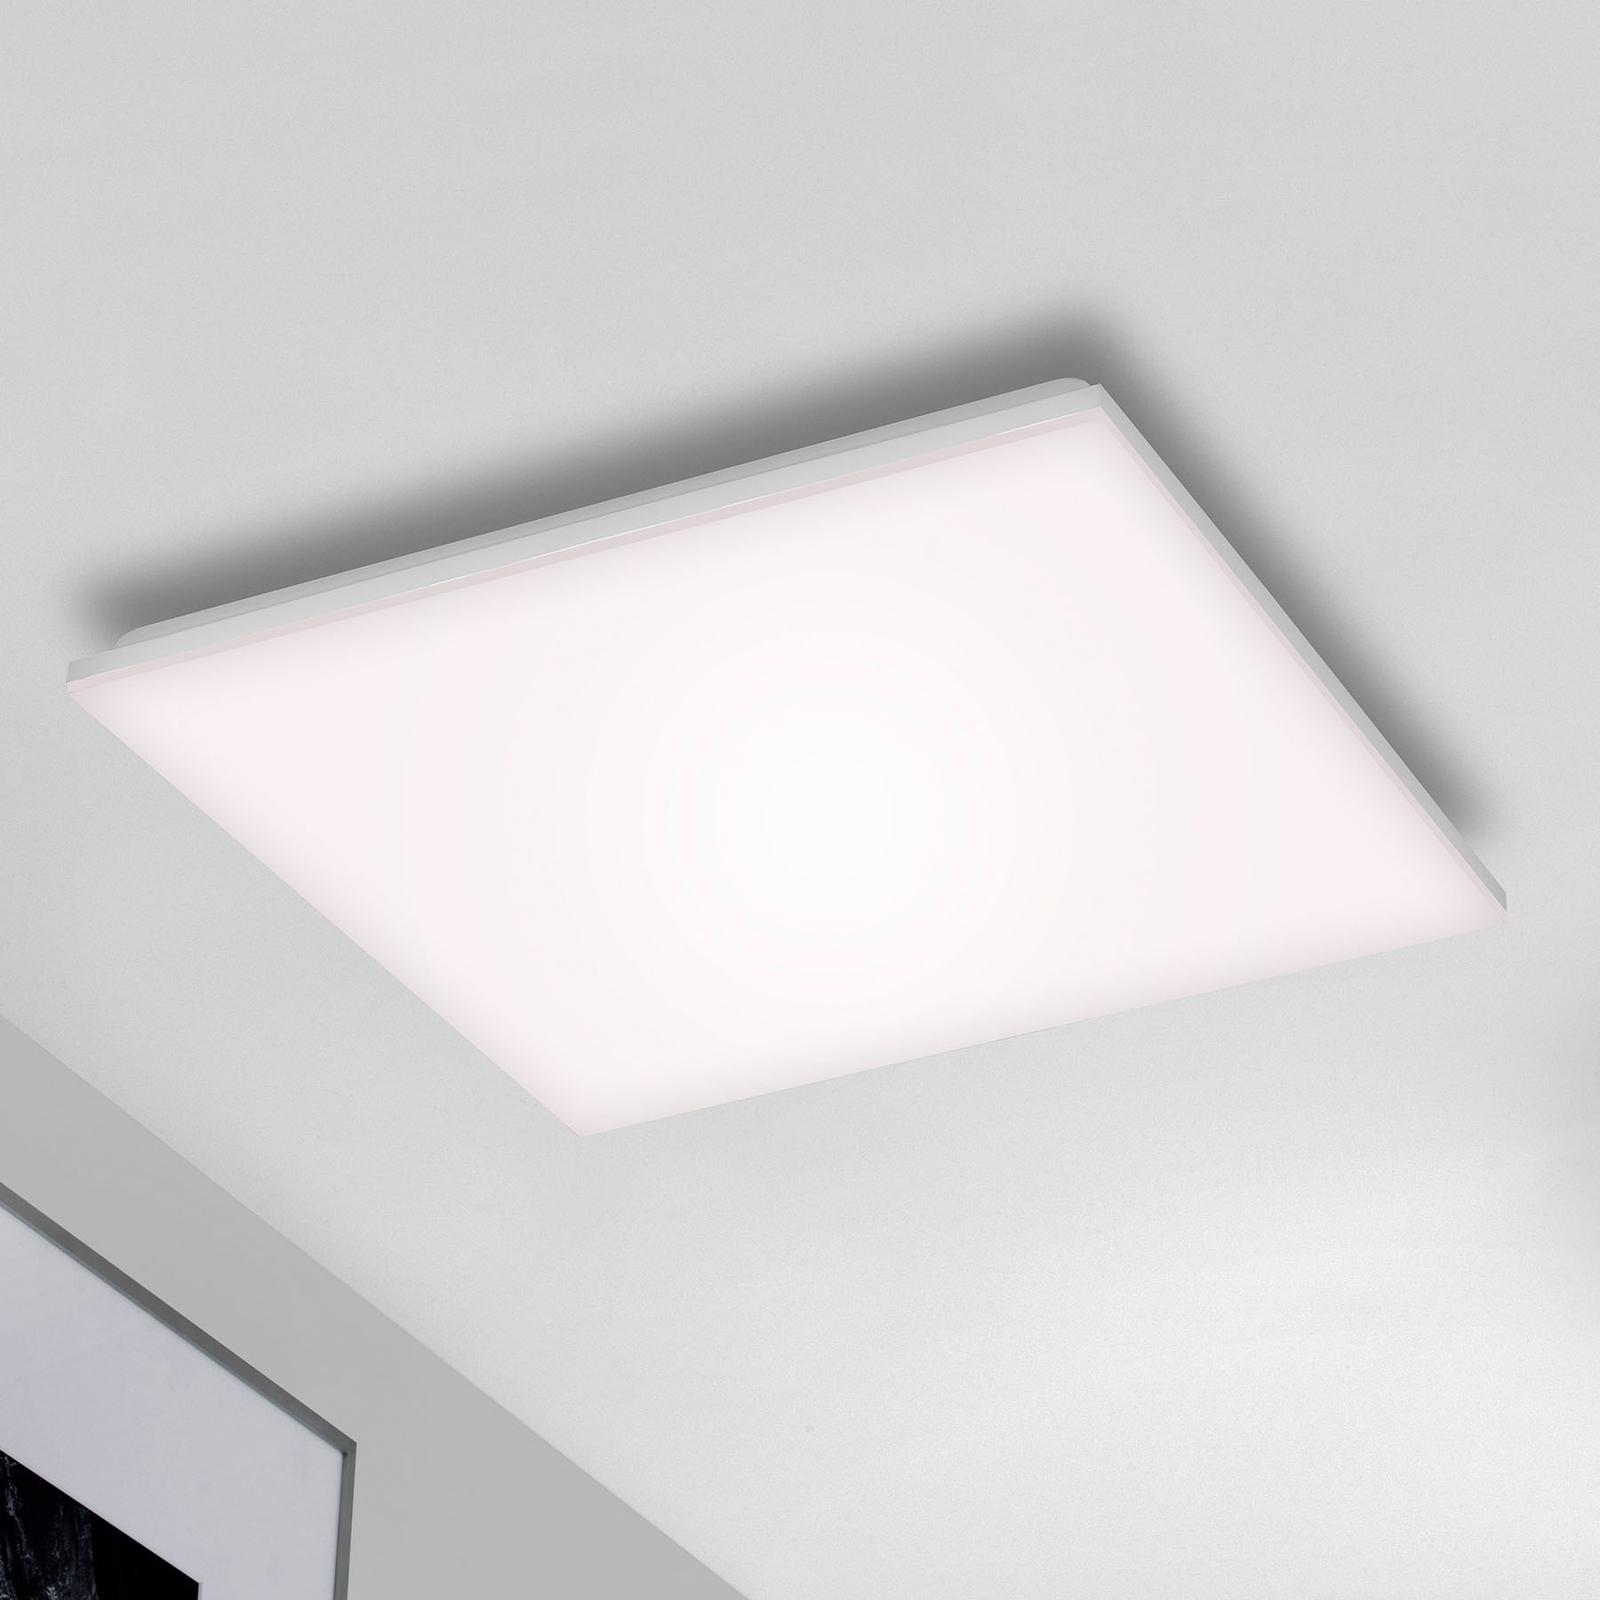 LED-kattovalaisin Frameless RGBW, 60x60cm